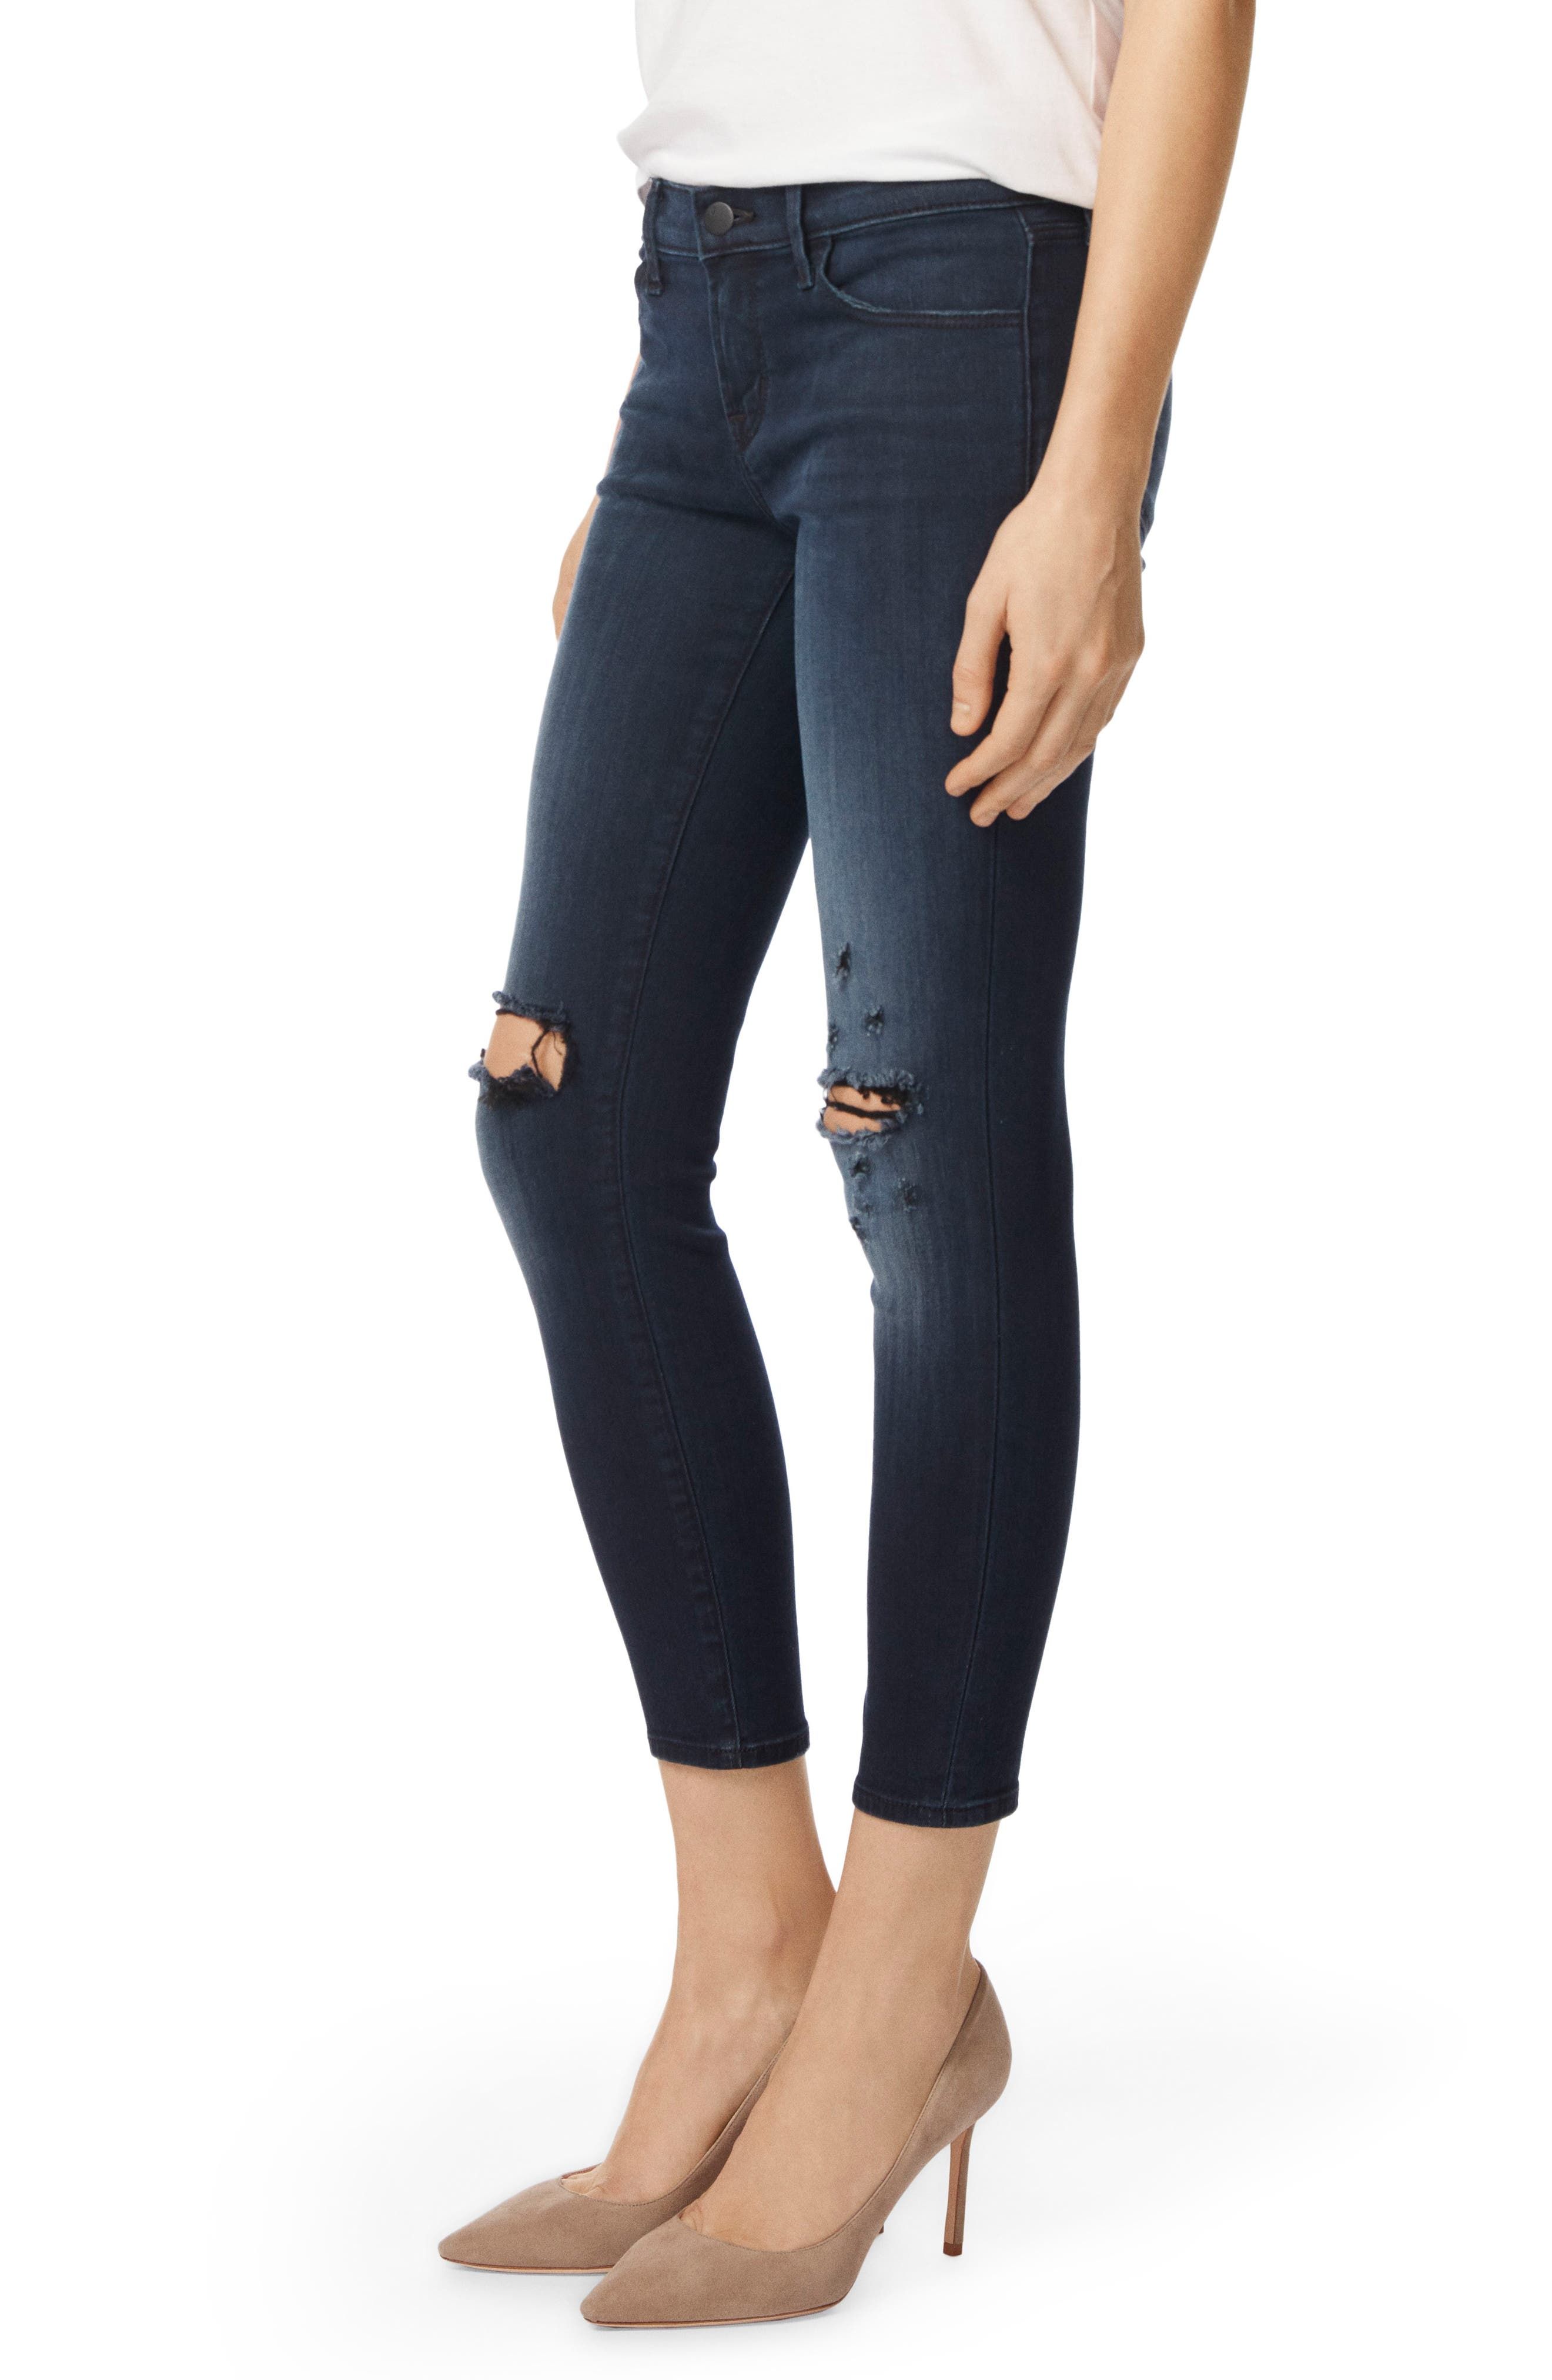 Alternate Image 3  - J Brand 9326 Low Rise Crop Skinny Jeans (Black Sea)